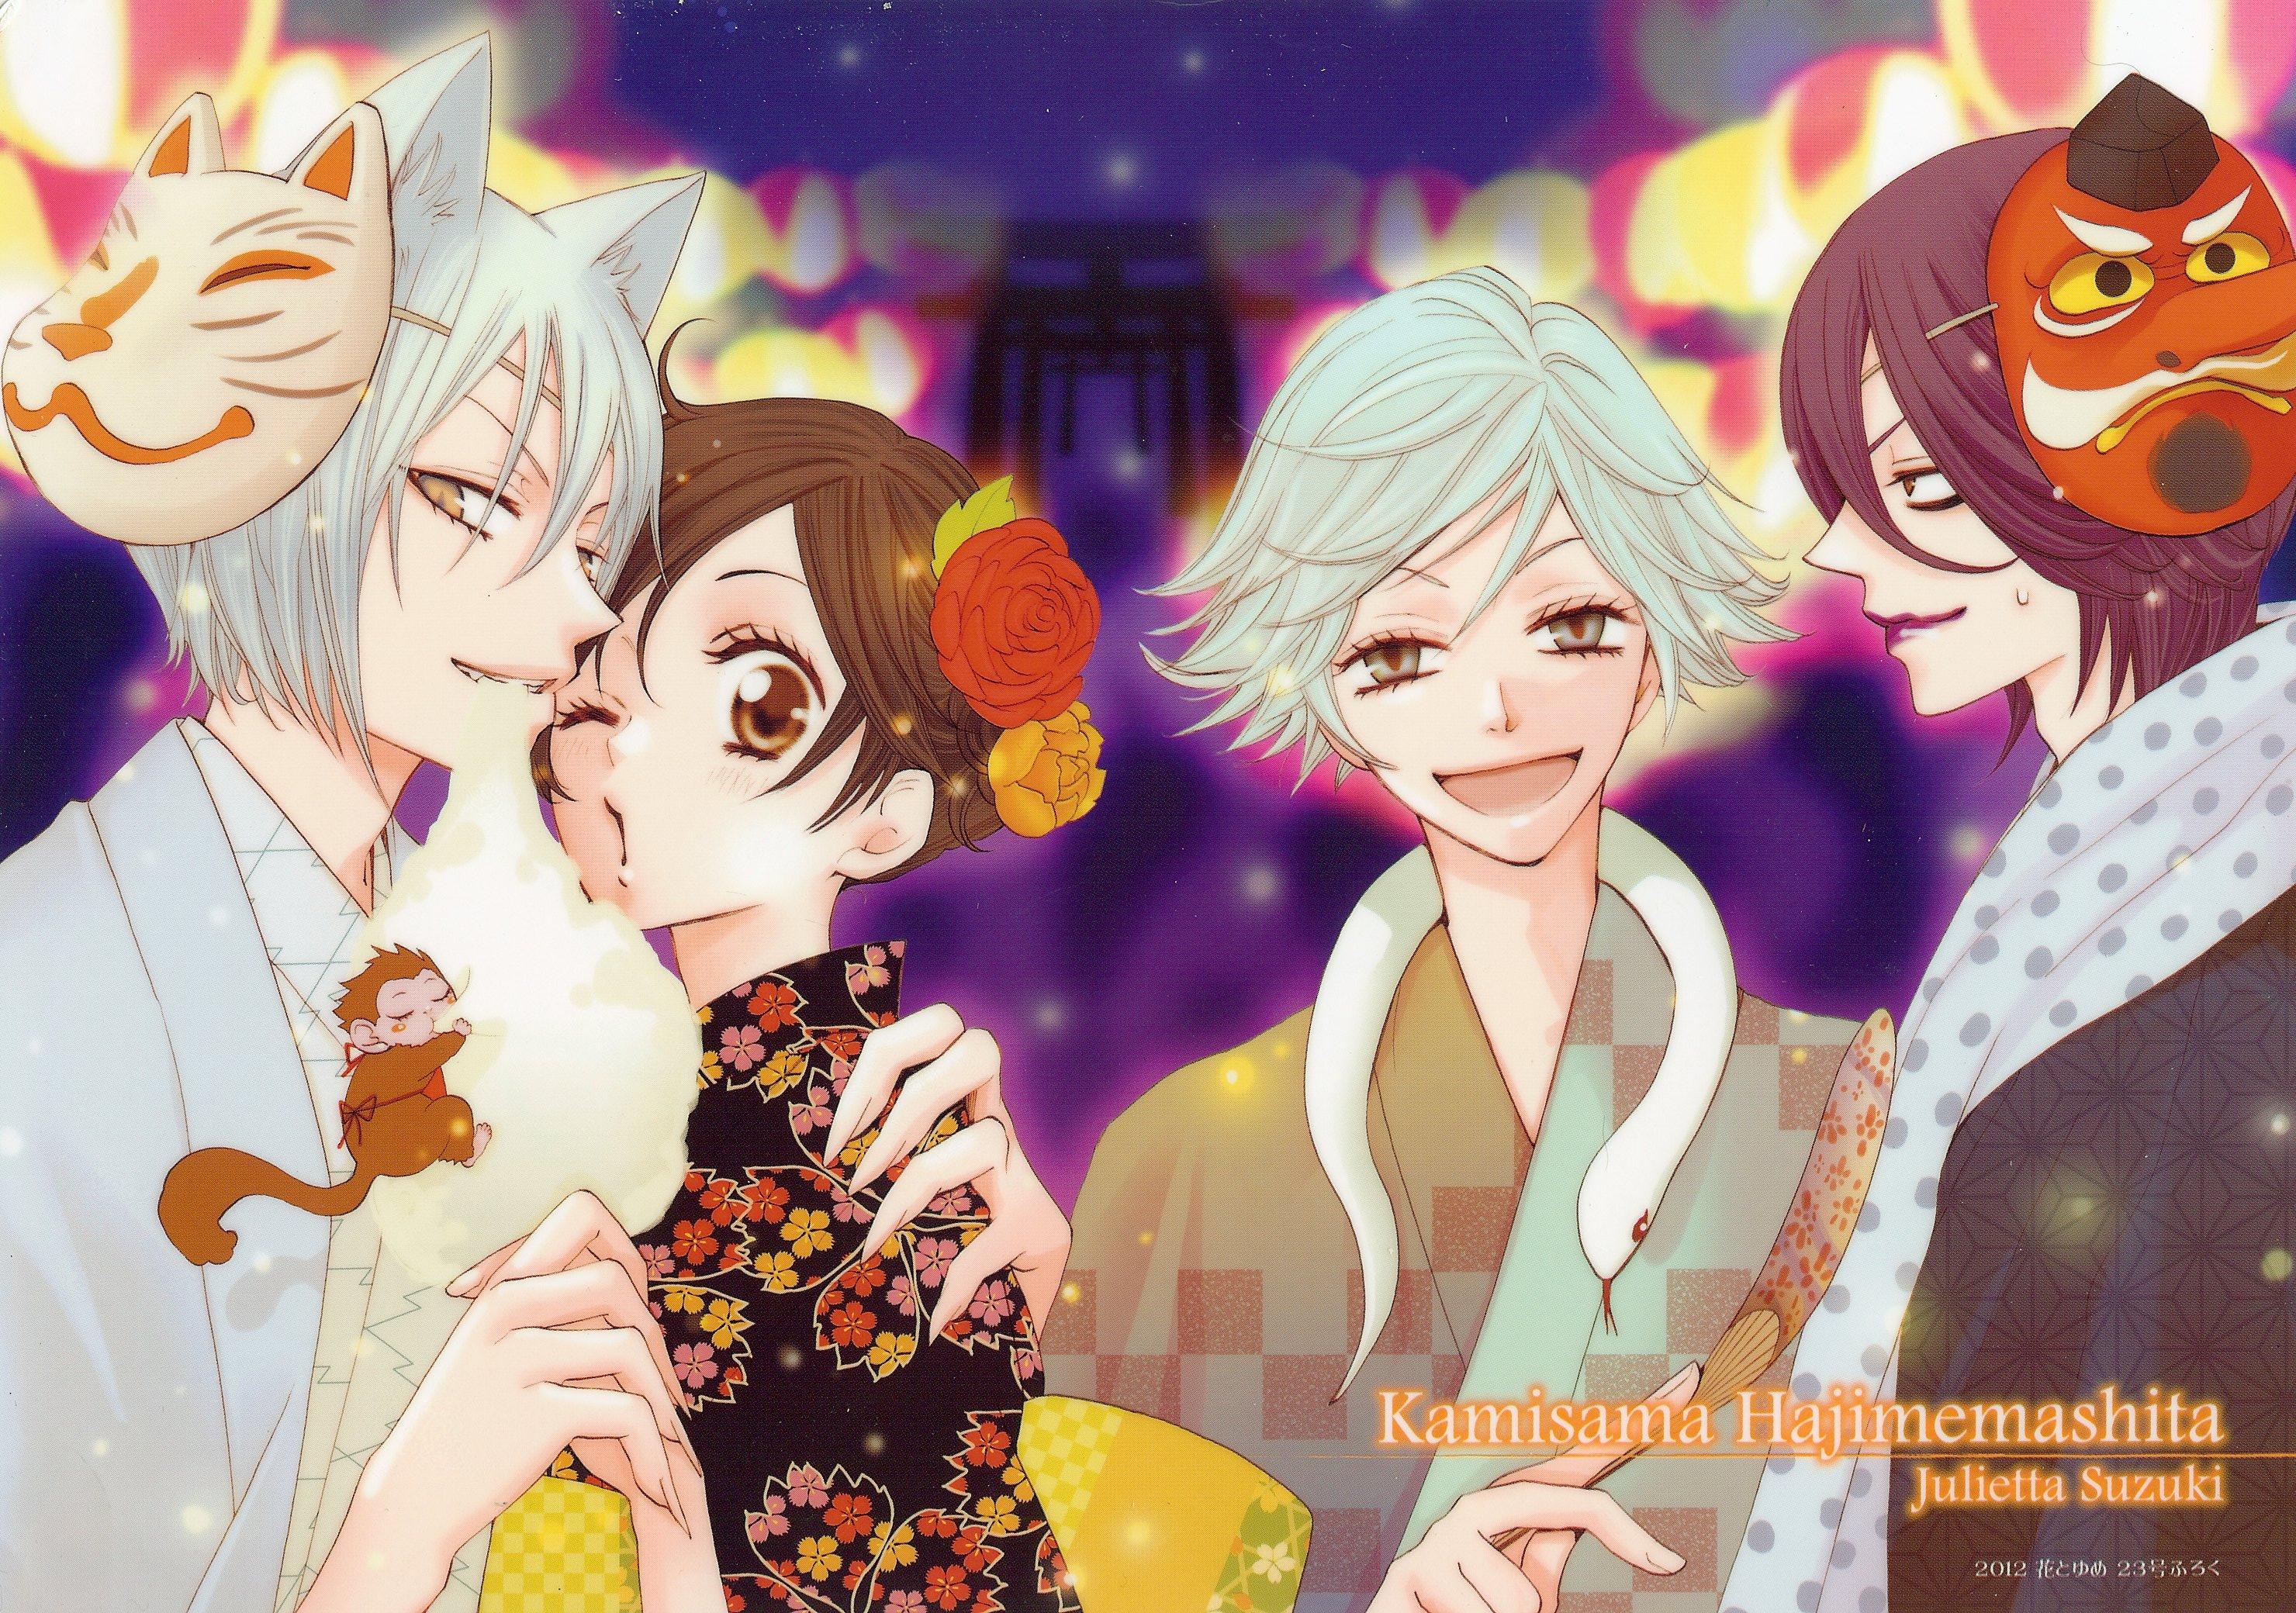 Kamisama Hajimemashita (Kamisama Kiss) Image #1326216 - Zerochan Anime  Image Board